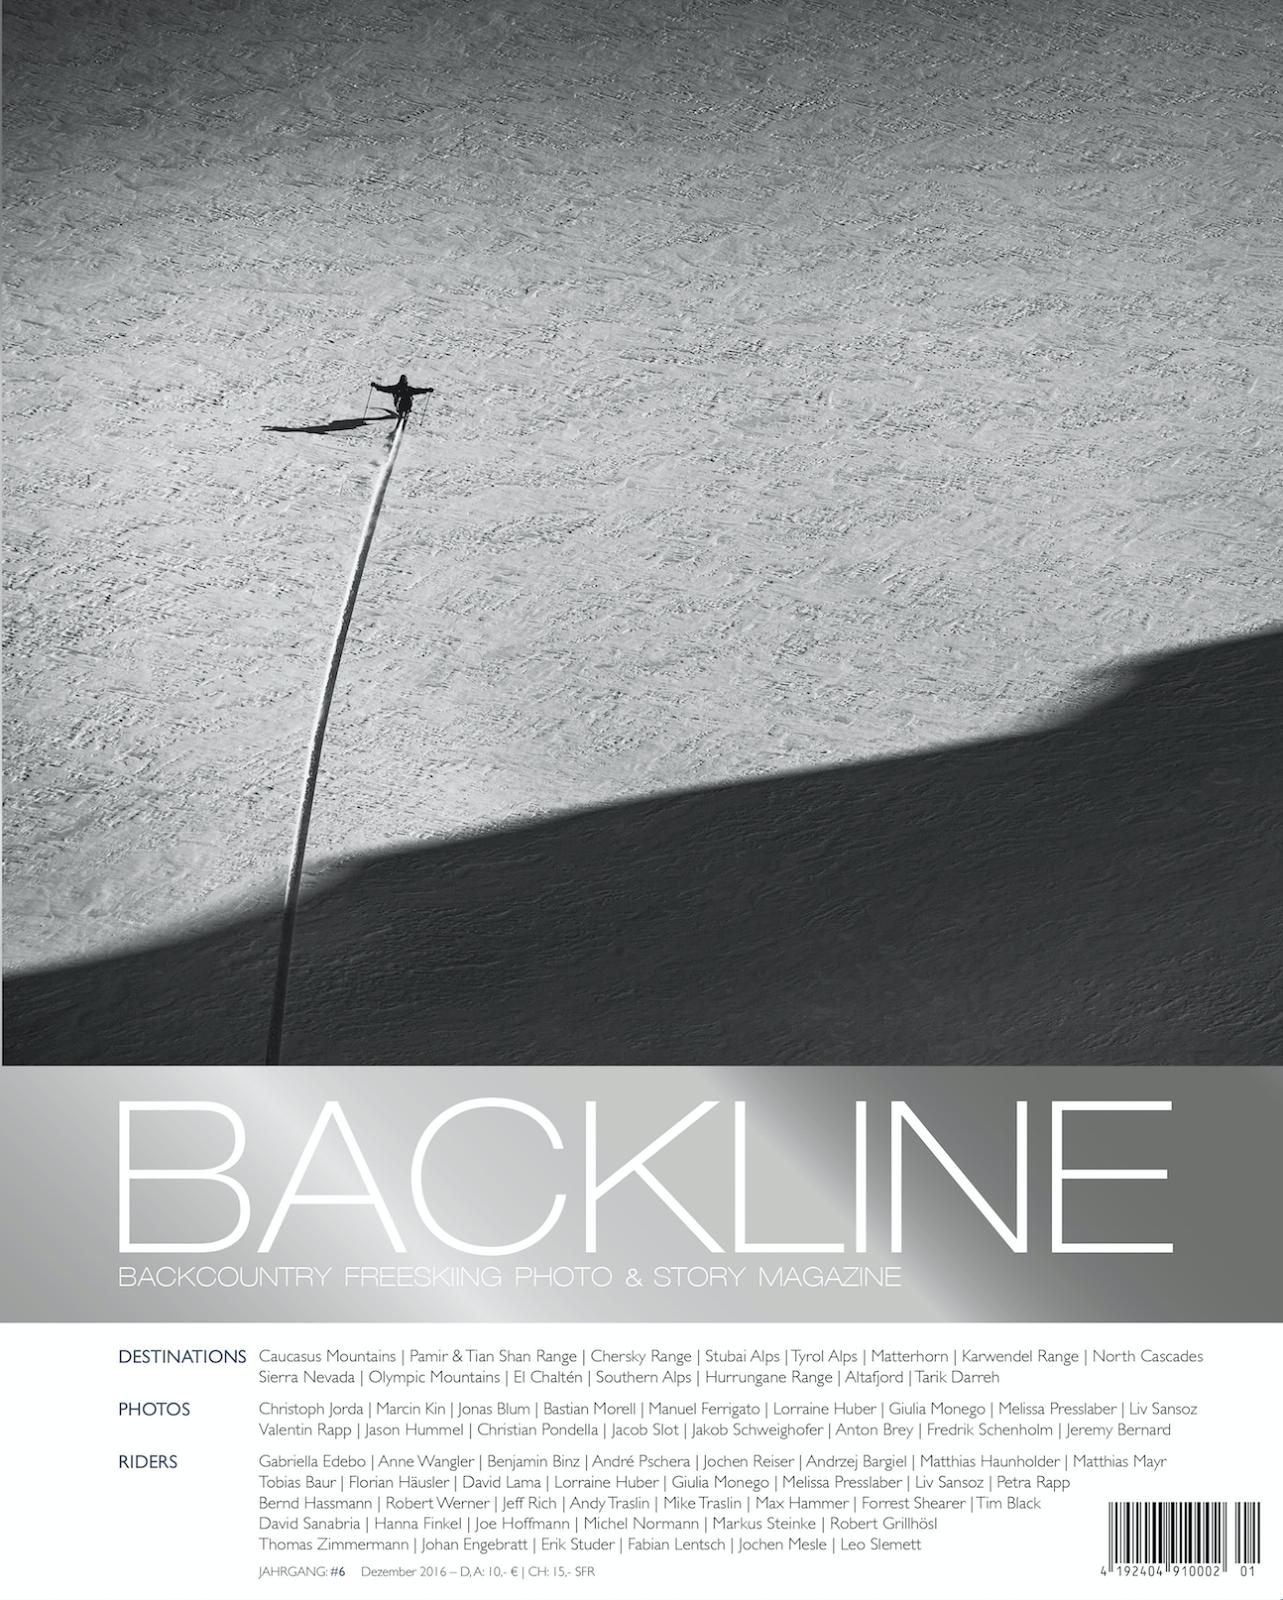 BACKLINE 2016 / 2017